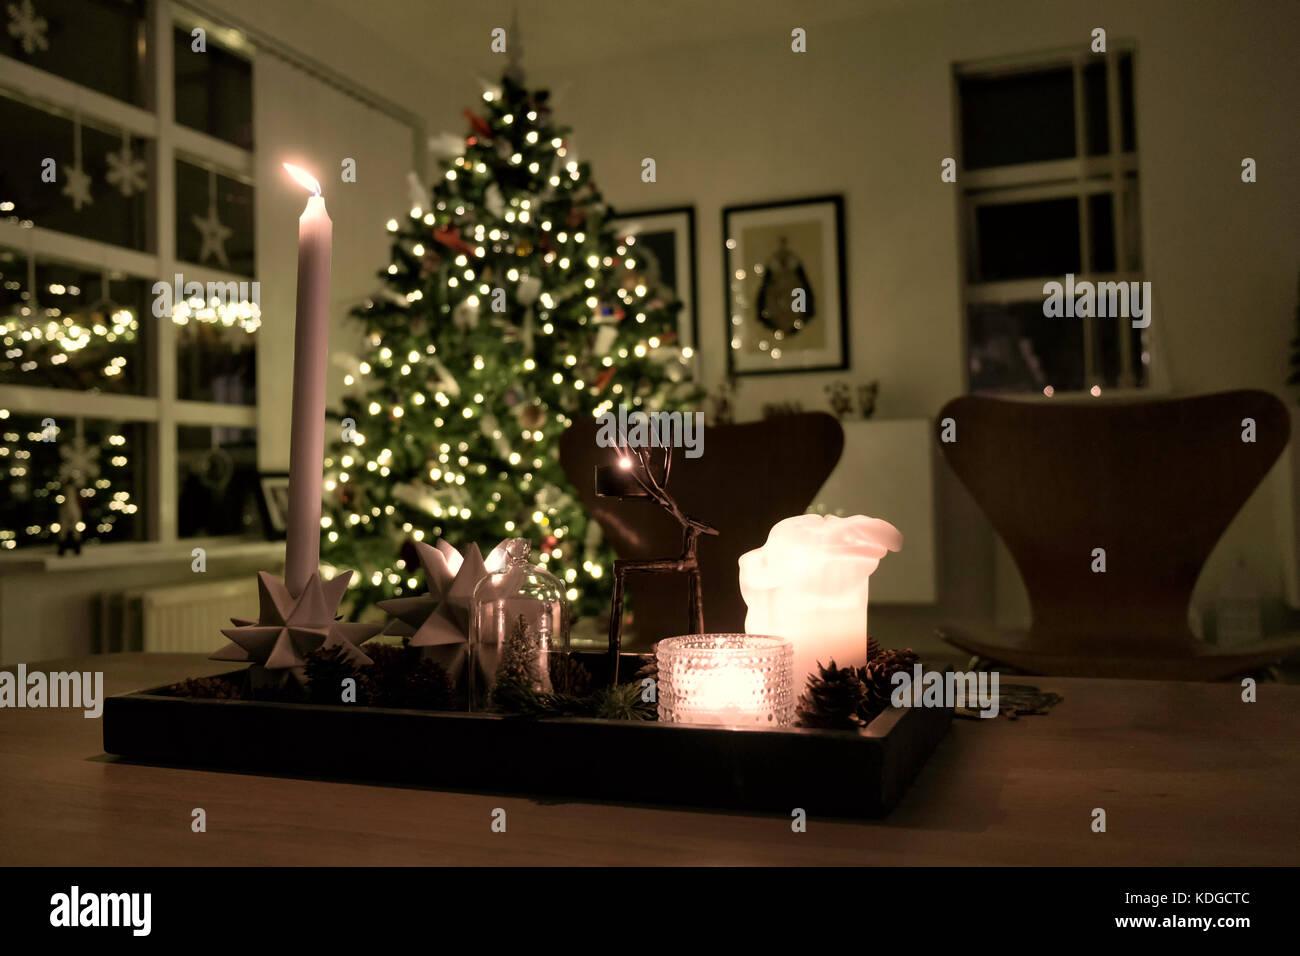 Christmas Living Room Night After Stockfotos & Christmas Living Room ...